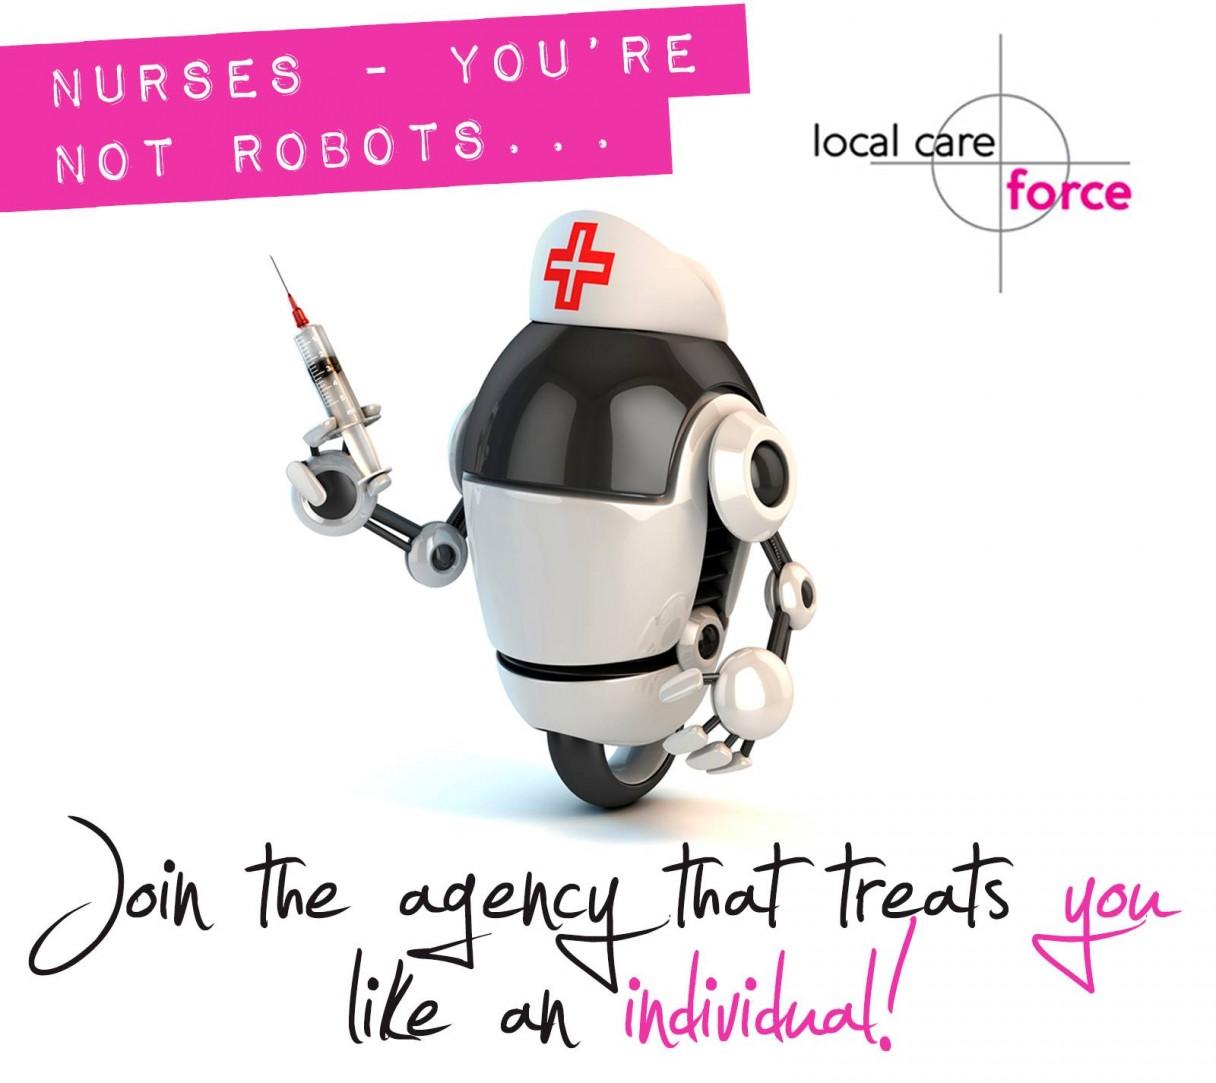 robot nurse